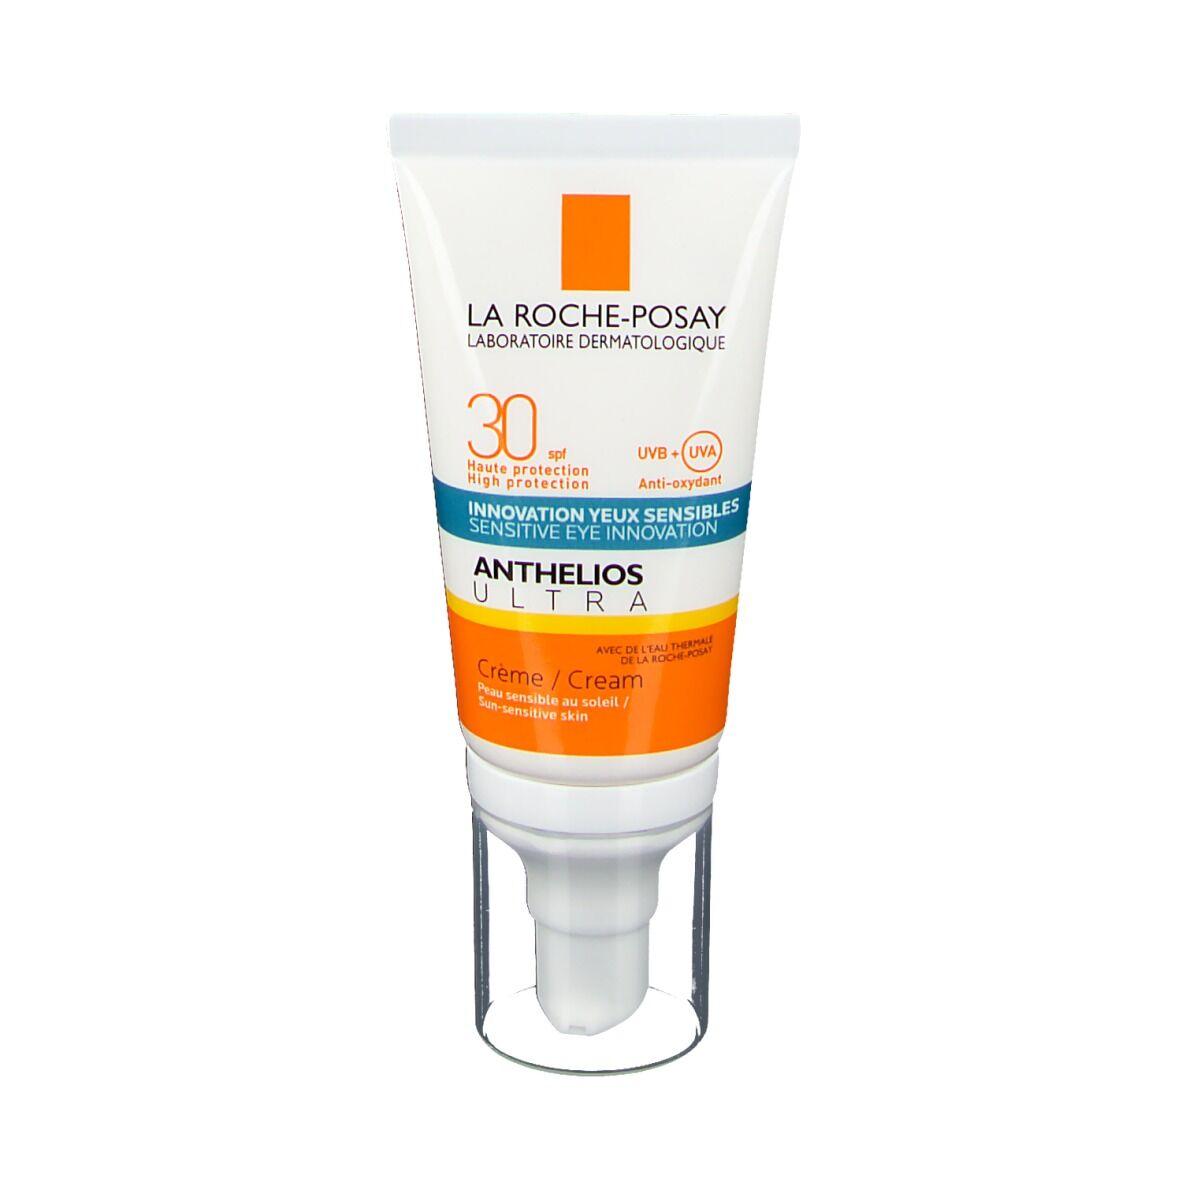 LA ROCHE POSAY ANTHELIOS Crème Confort SPF30 ml crème solaire